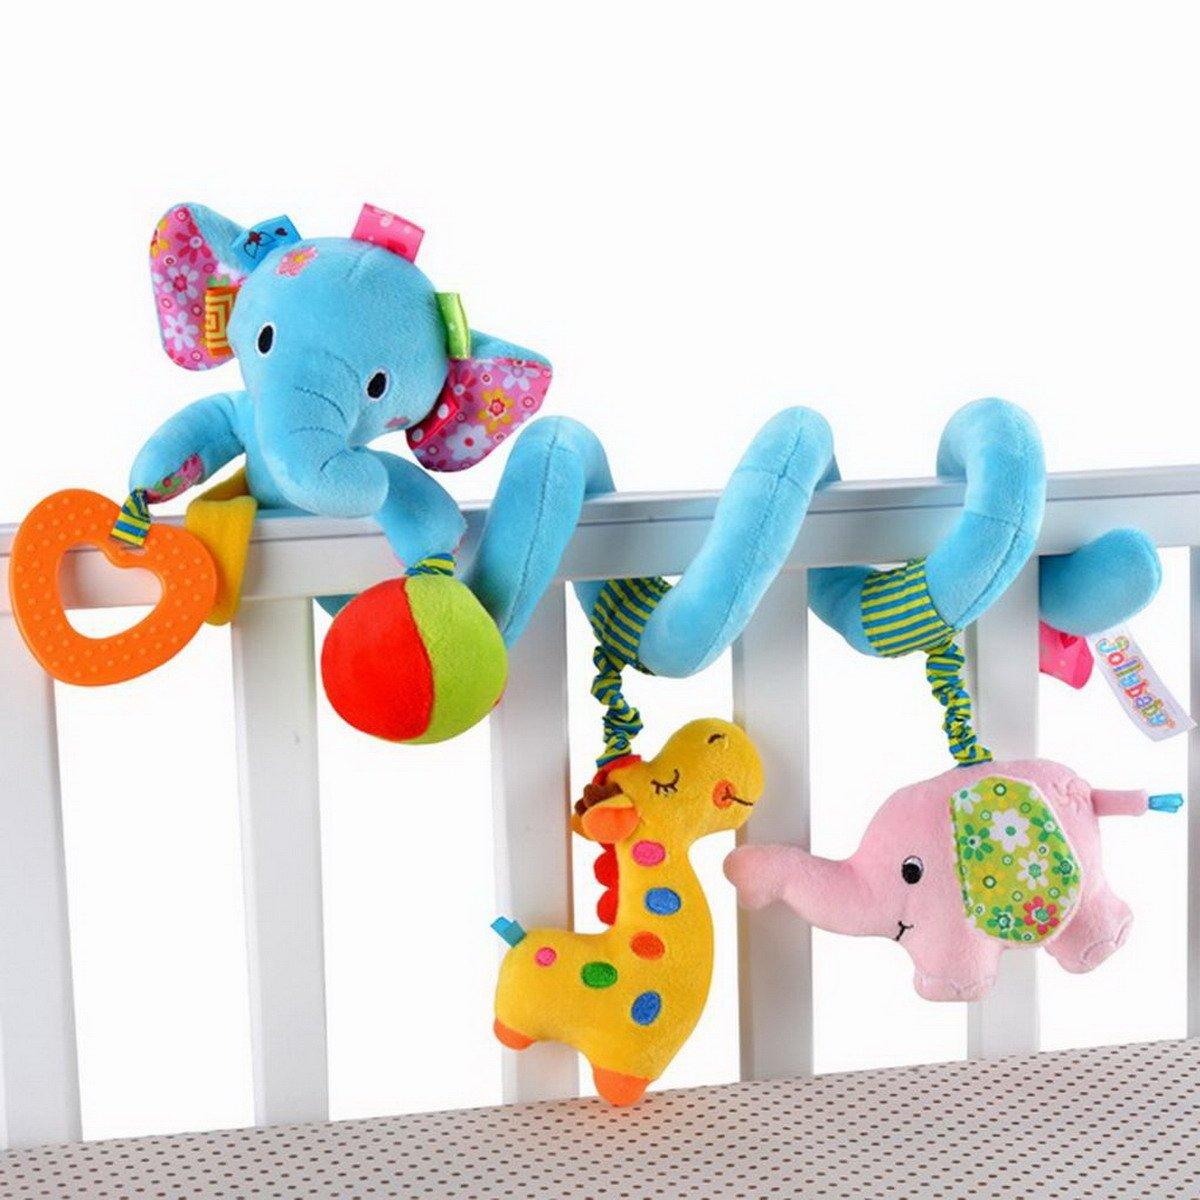 Elefant-Entwurf Säuglings-Baby-Activity-Spirale Bed & Kinderwagen Spielzeug-Bett rattert Glocke hängen Krippe Spielzeug, Blau Ahatech